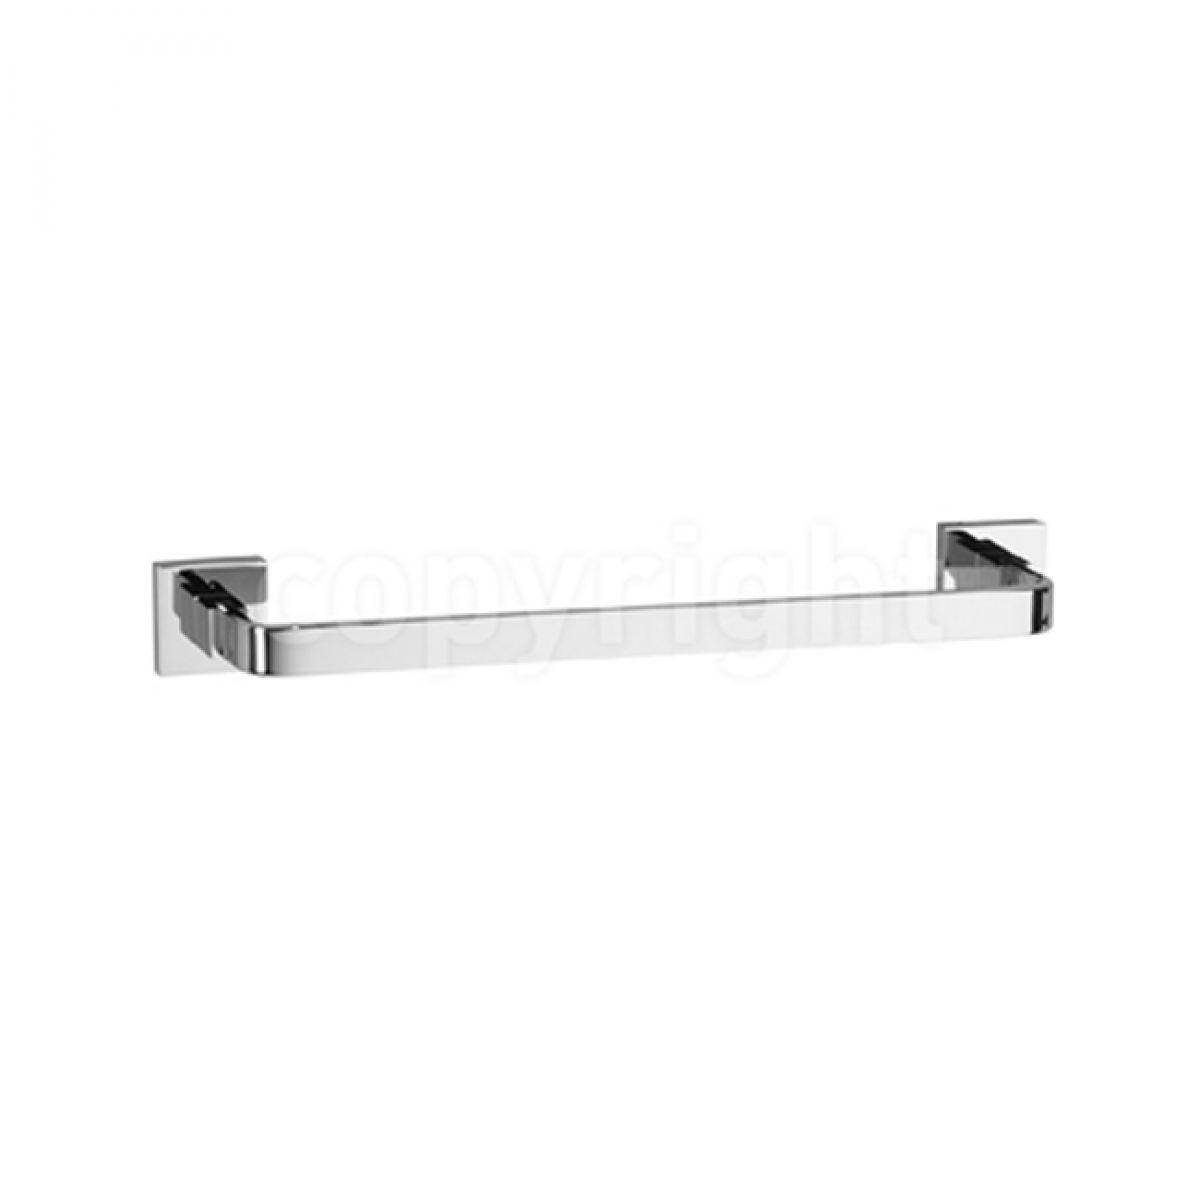 Crosswater zeya towel rail small uk bathrooms - Bathroom accessories towel rail ...